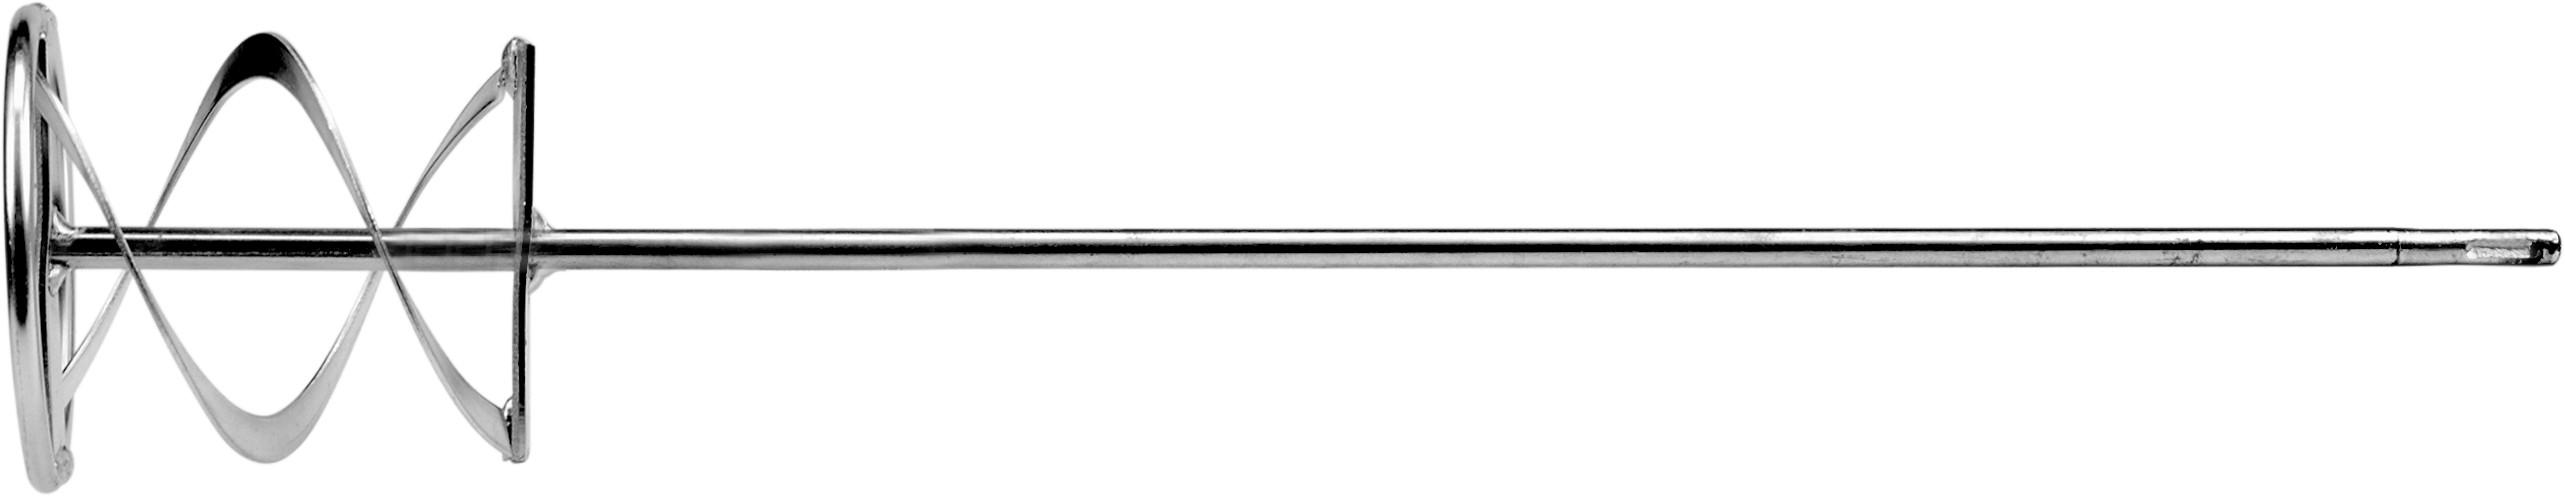 Míchadlo 120x600 C-120 SDS